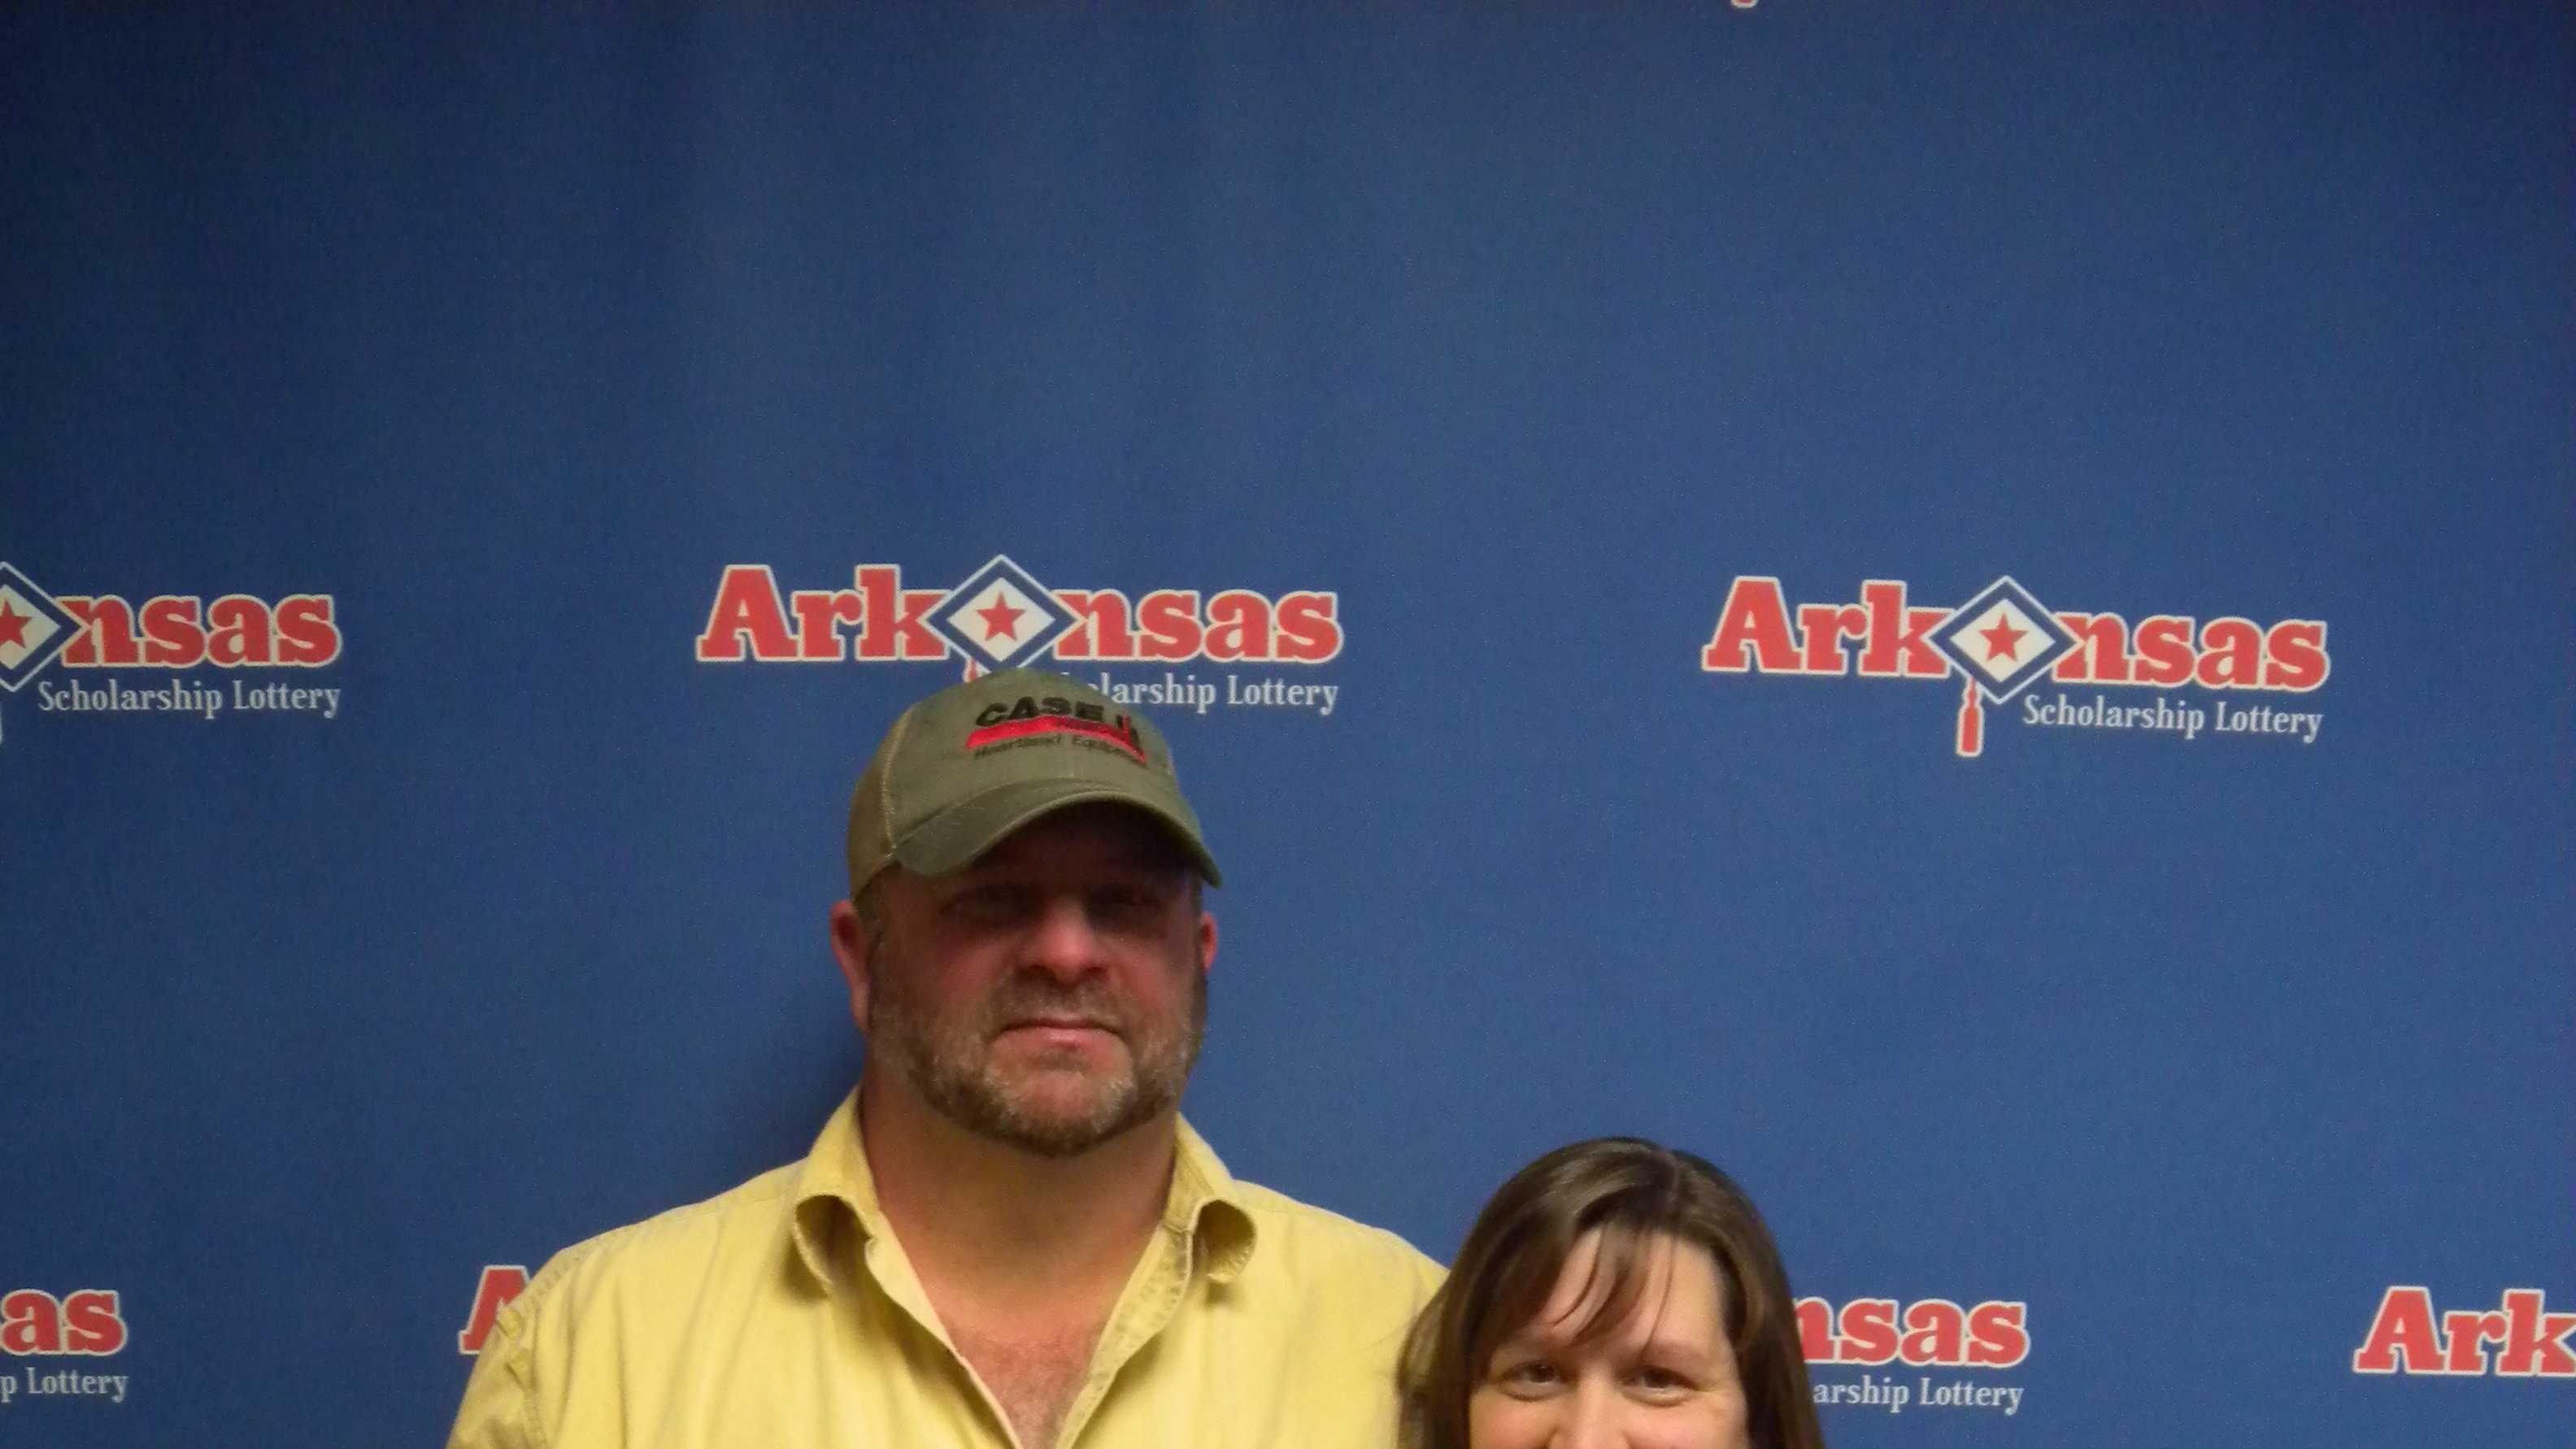 Lottery Winner Arkansas